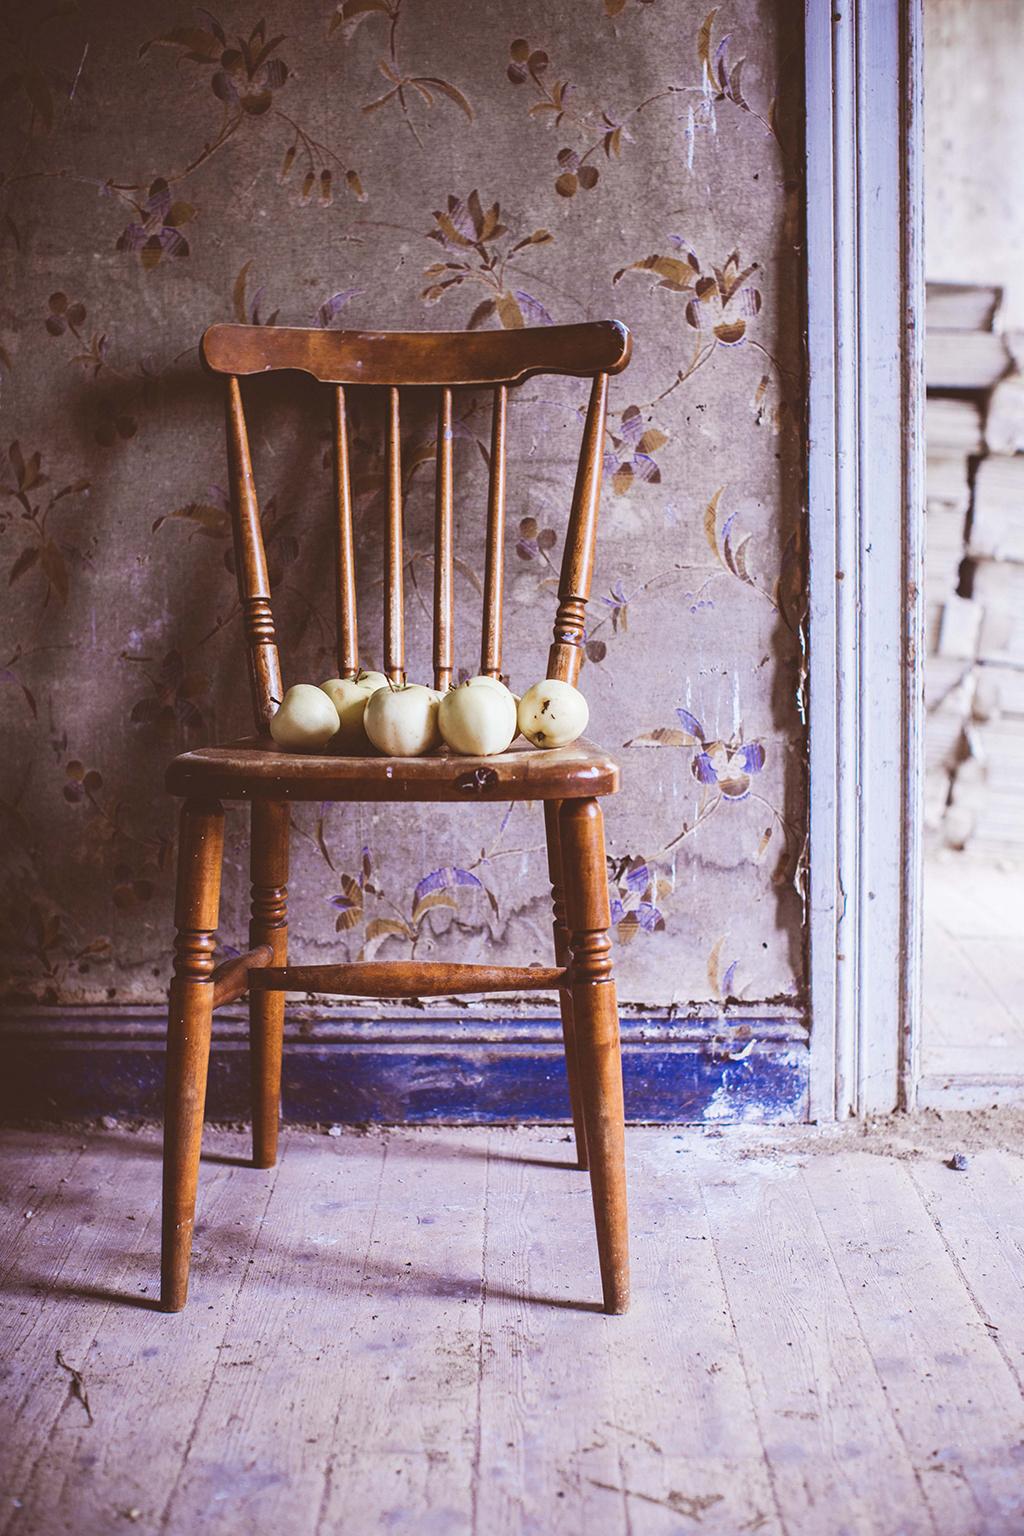 Lovelylife_apples_krickelin-8279